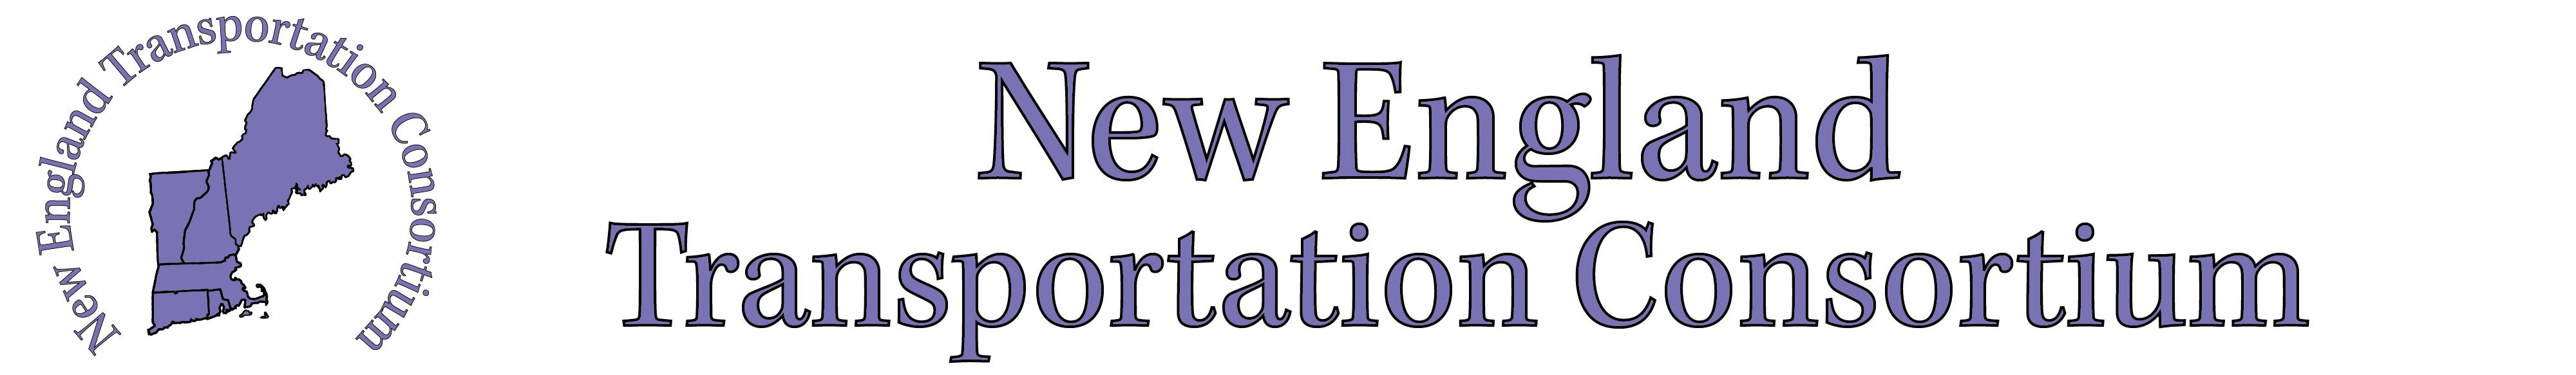 New England Transportation Consortium